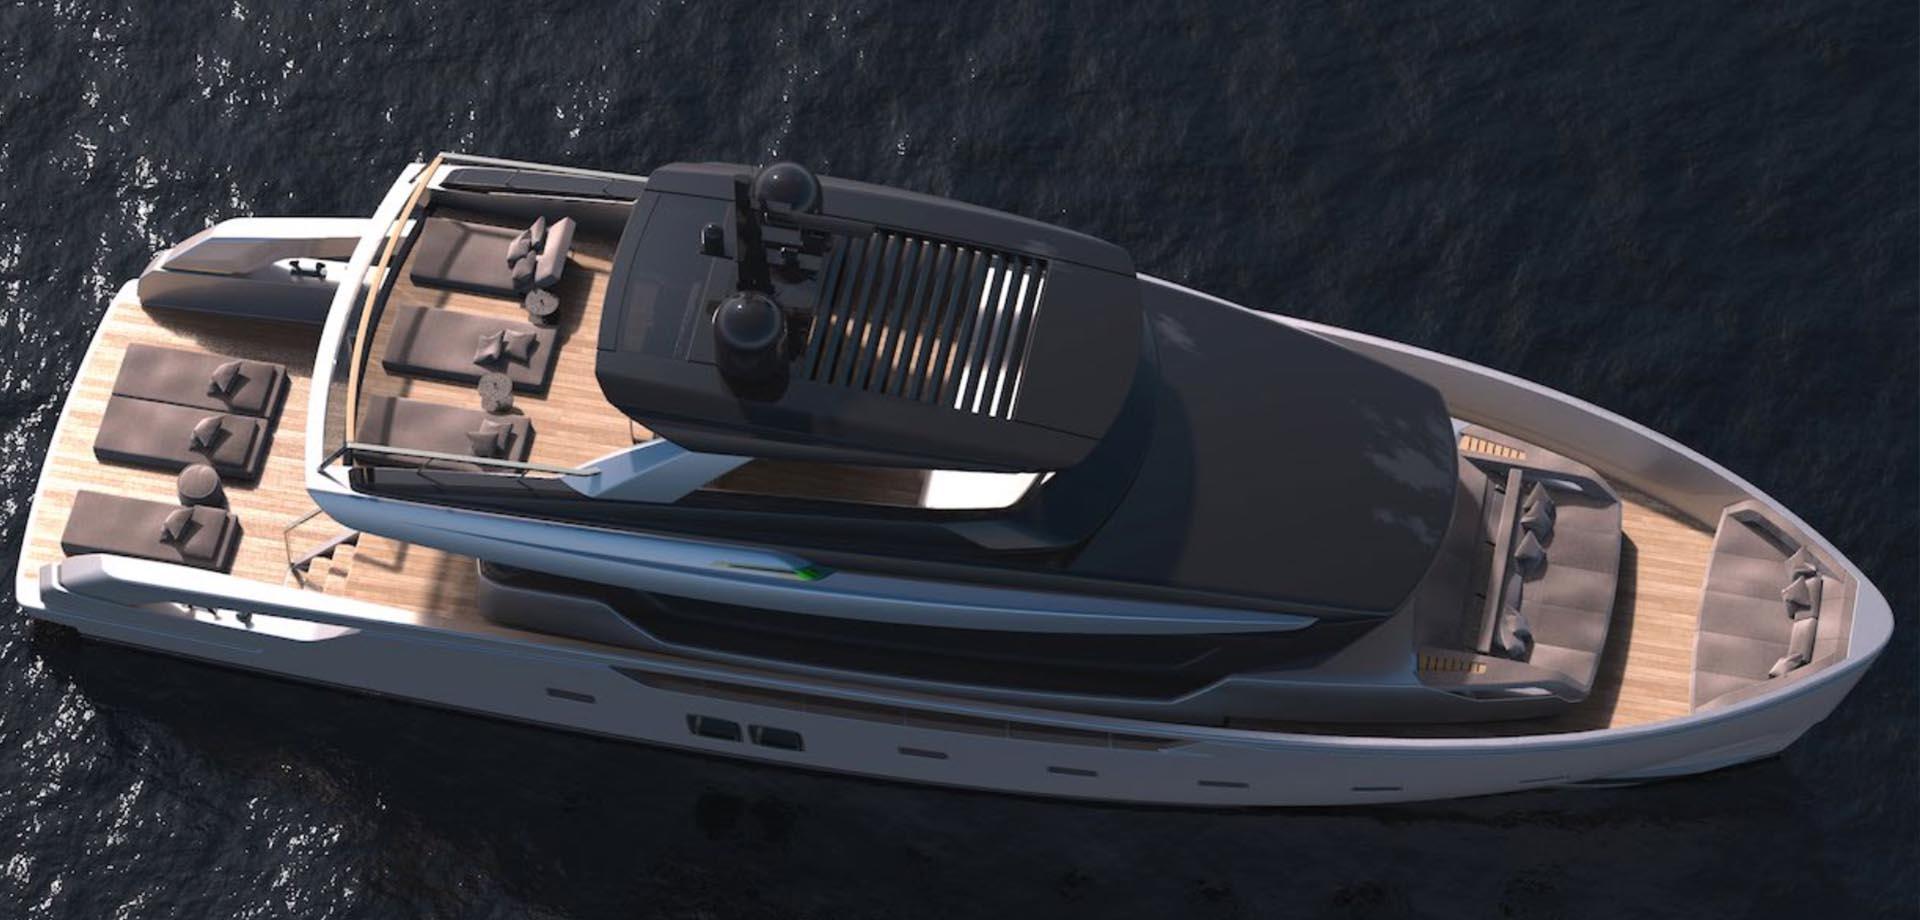 2018'SANLORENZOーSX76(輸入艇)